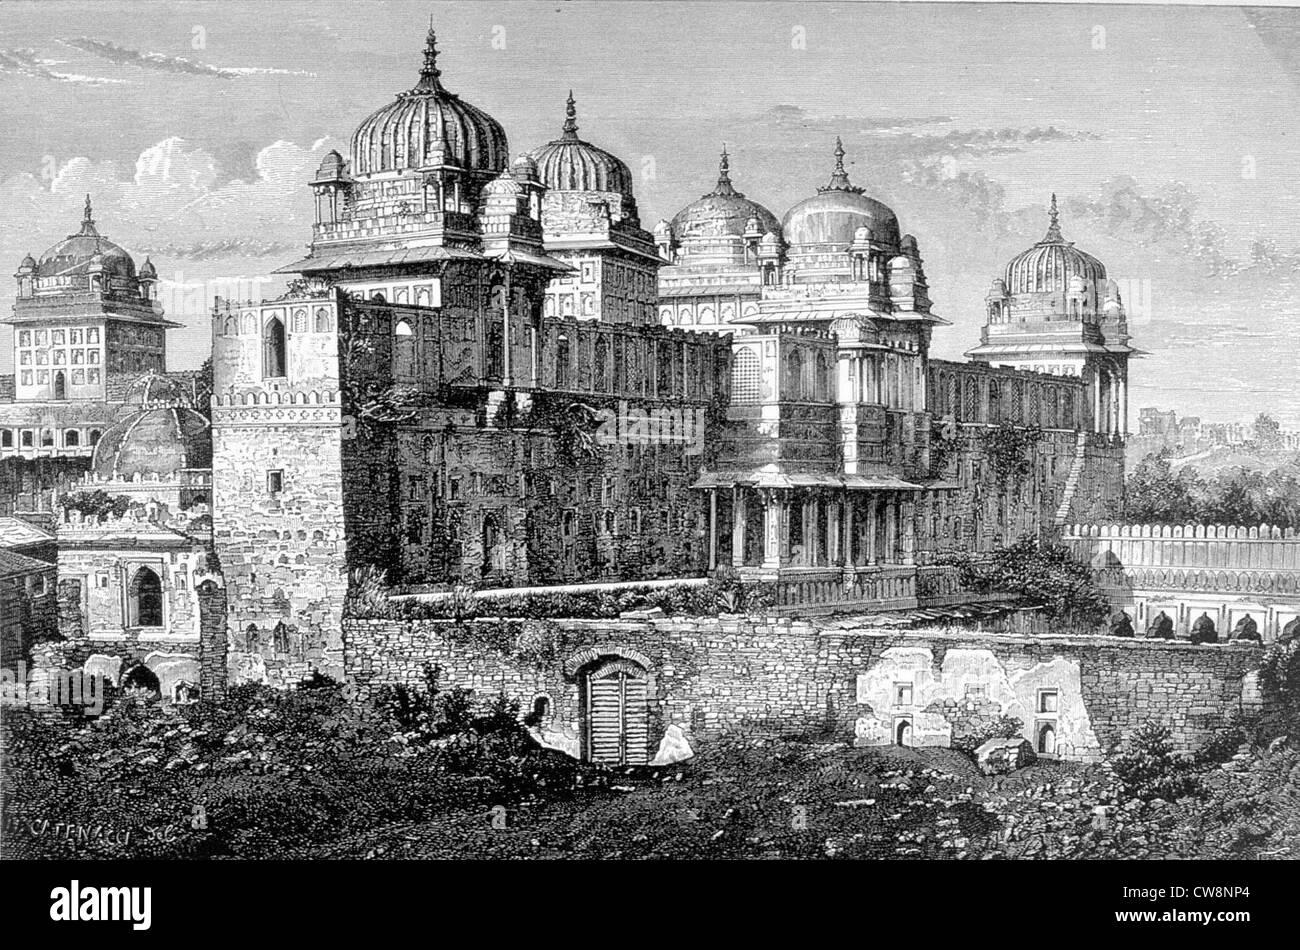 Raj Mahal (Royal Palace ) in Ourtcha - Stock Image